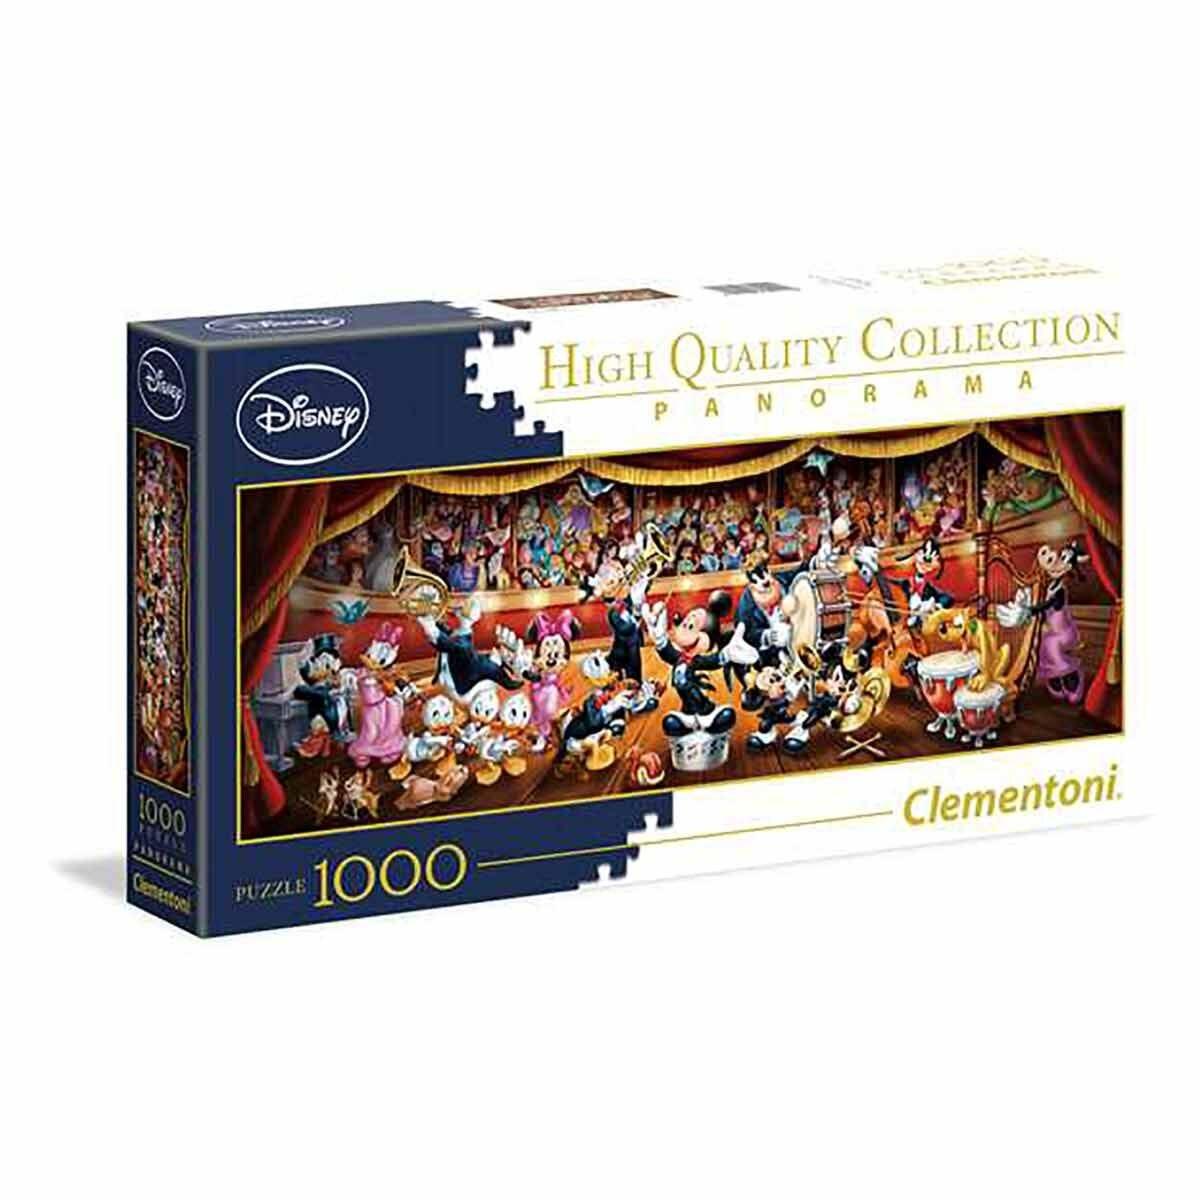 Clementoni Disney Classic Panorama 1000 Piece Jigsaw Puzzle